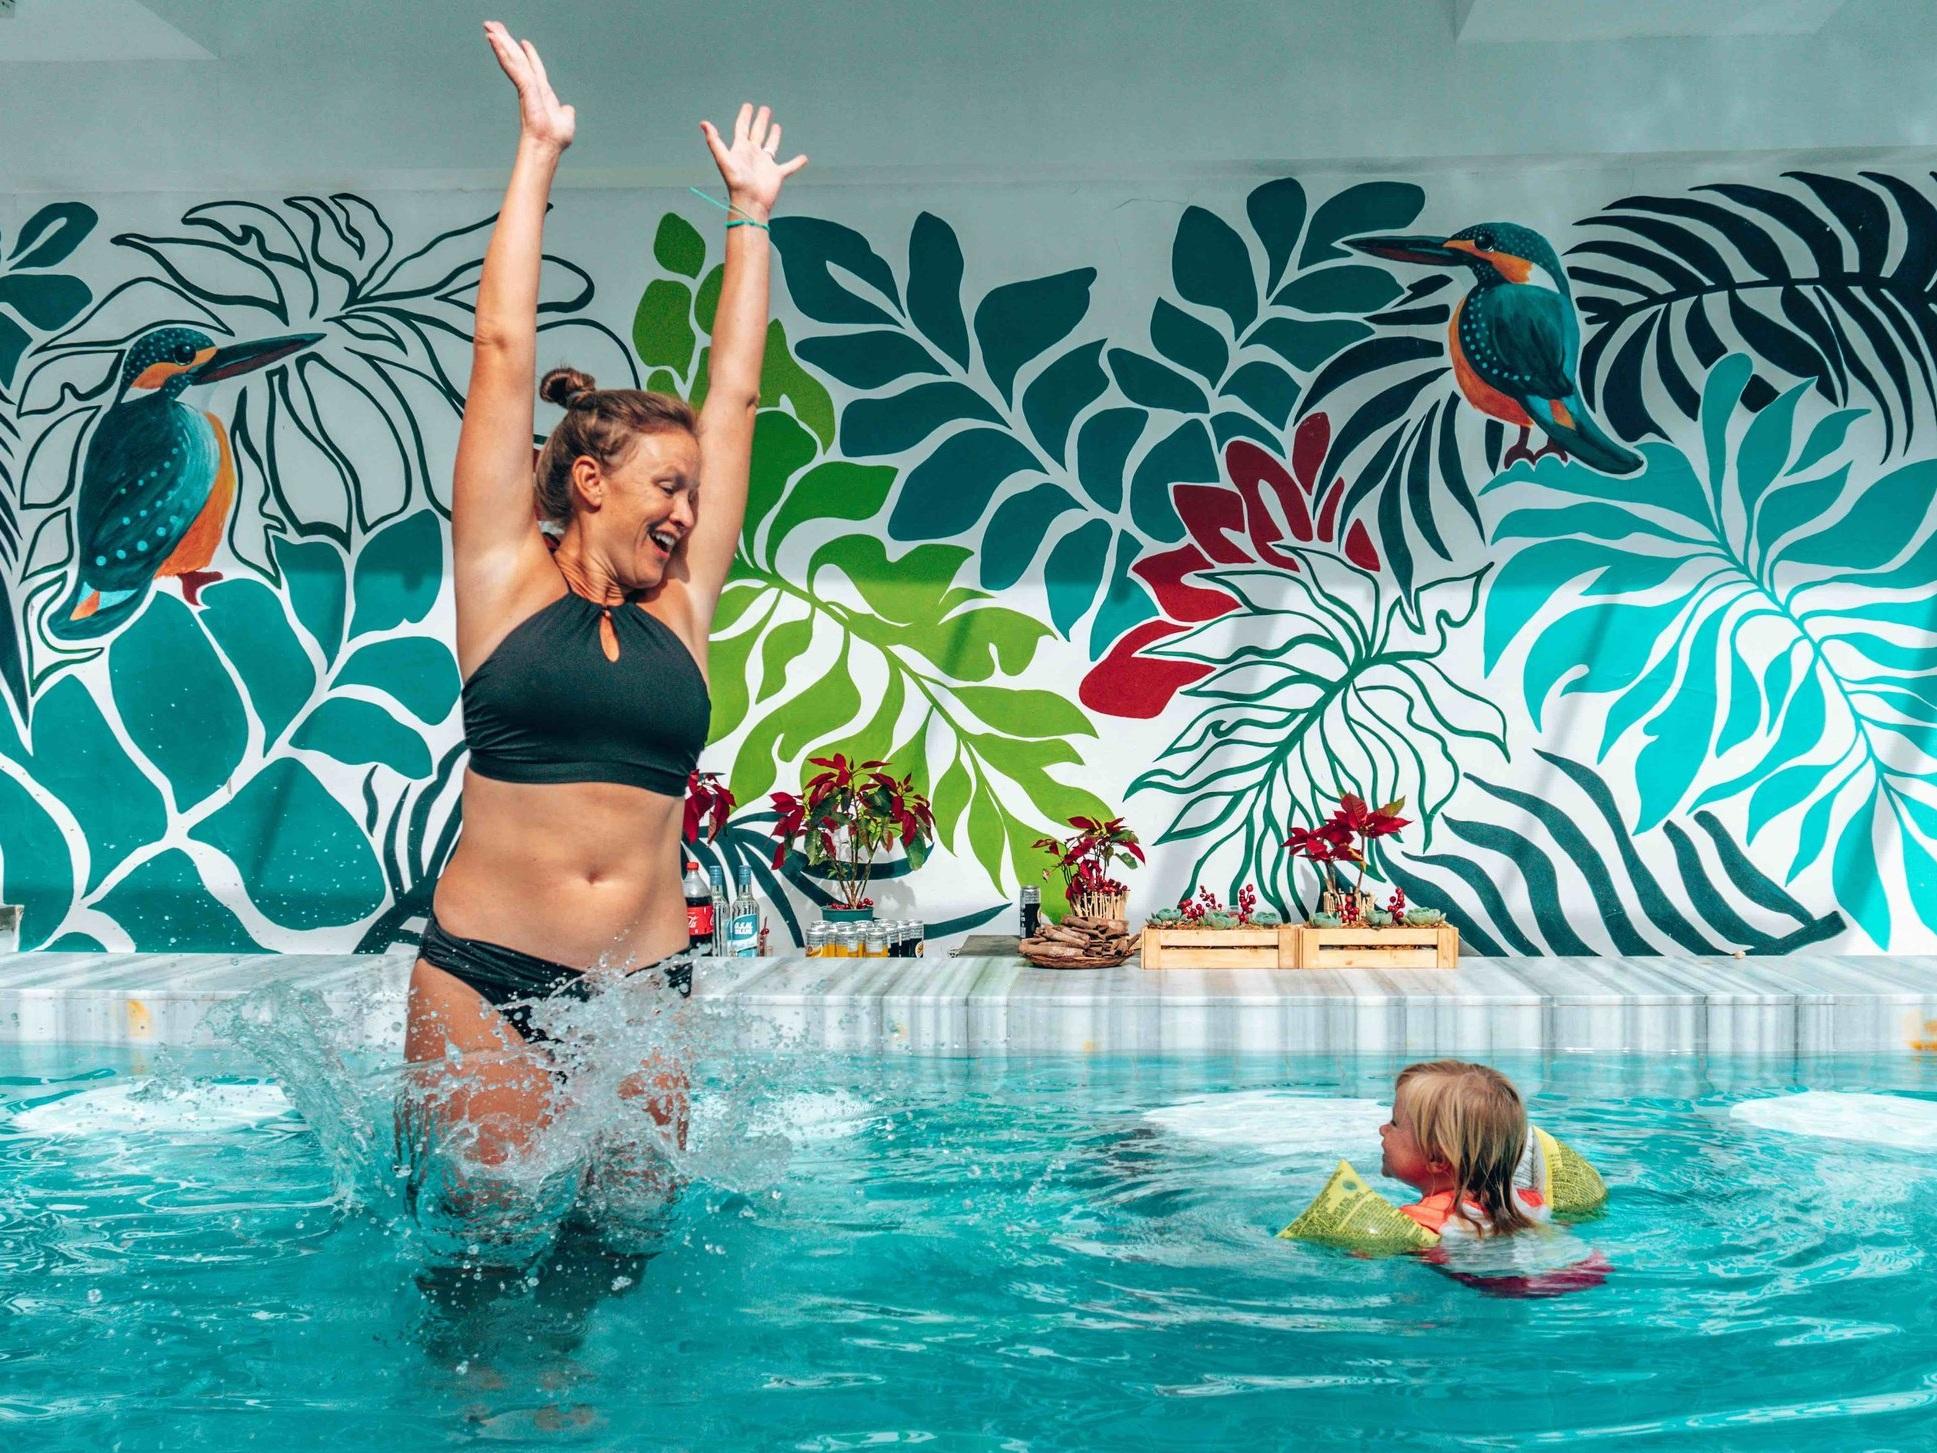 Pool_feature+wall_mother_daughter_splash_Coast+Boracay.jpg